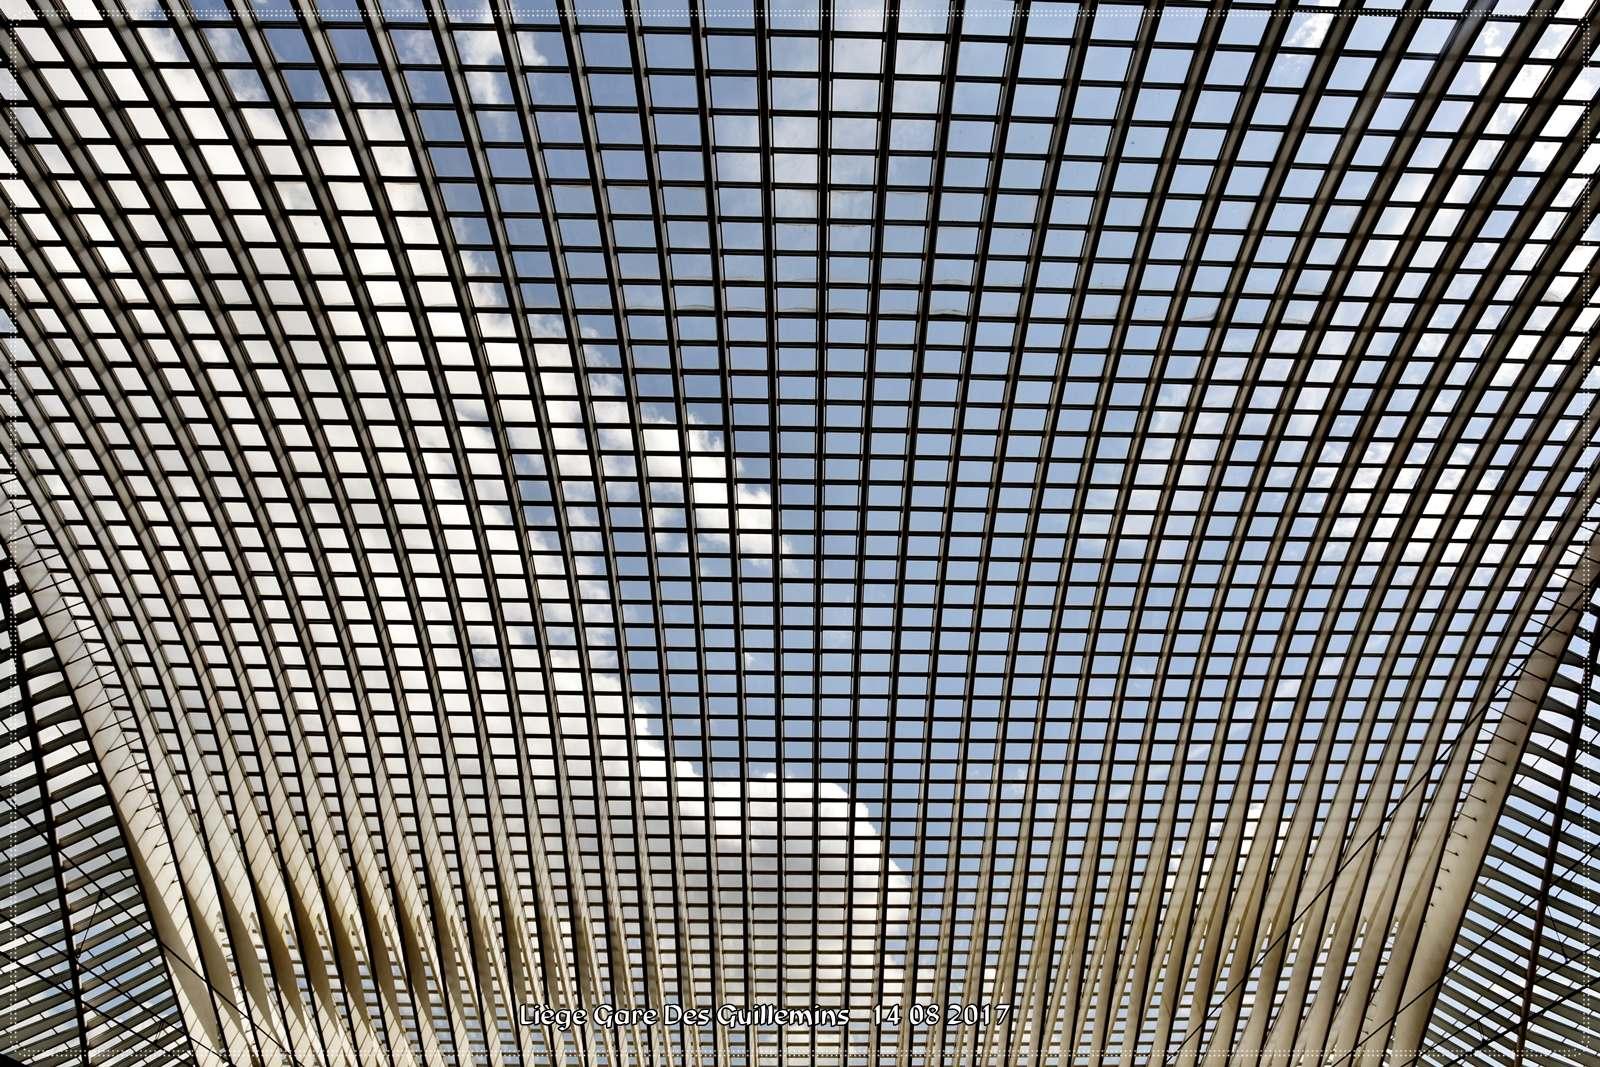 gare des guillemins3 Liege Guillemins Railway Station by Santiago Calatrava